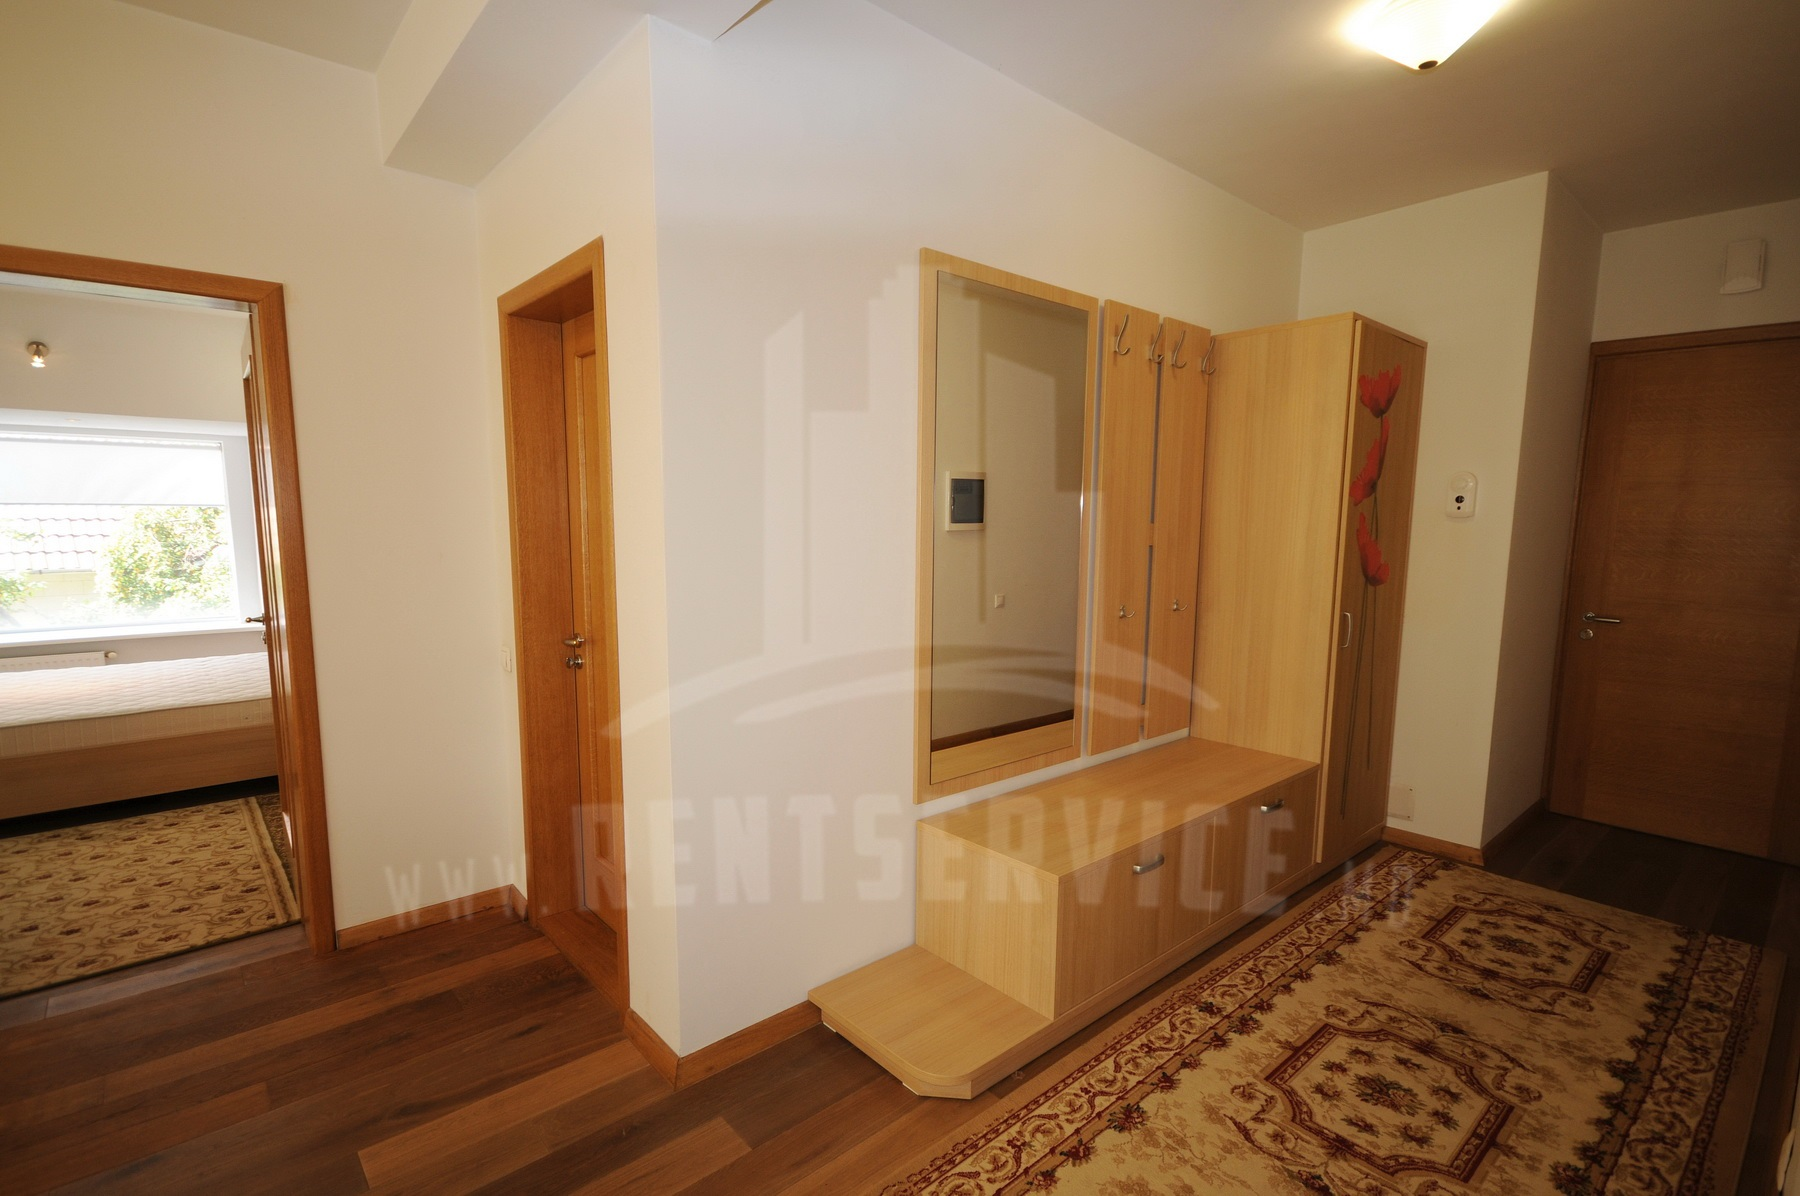 267_apartment_7.JPG